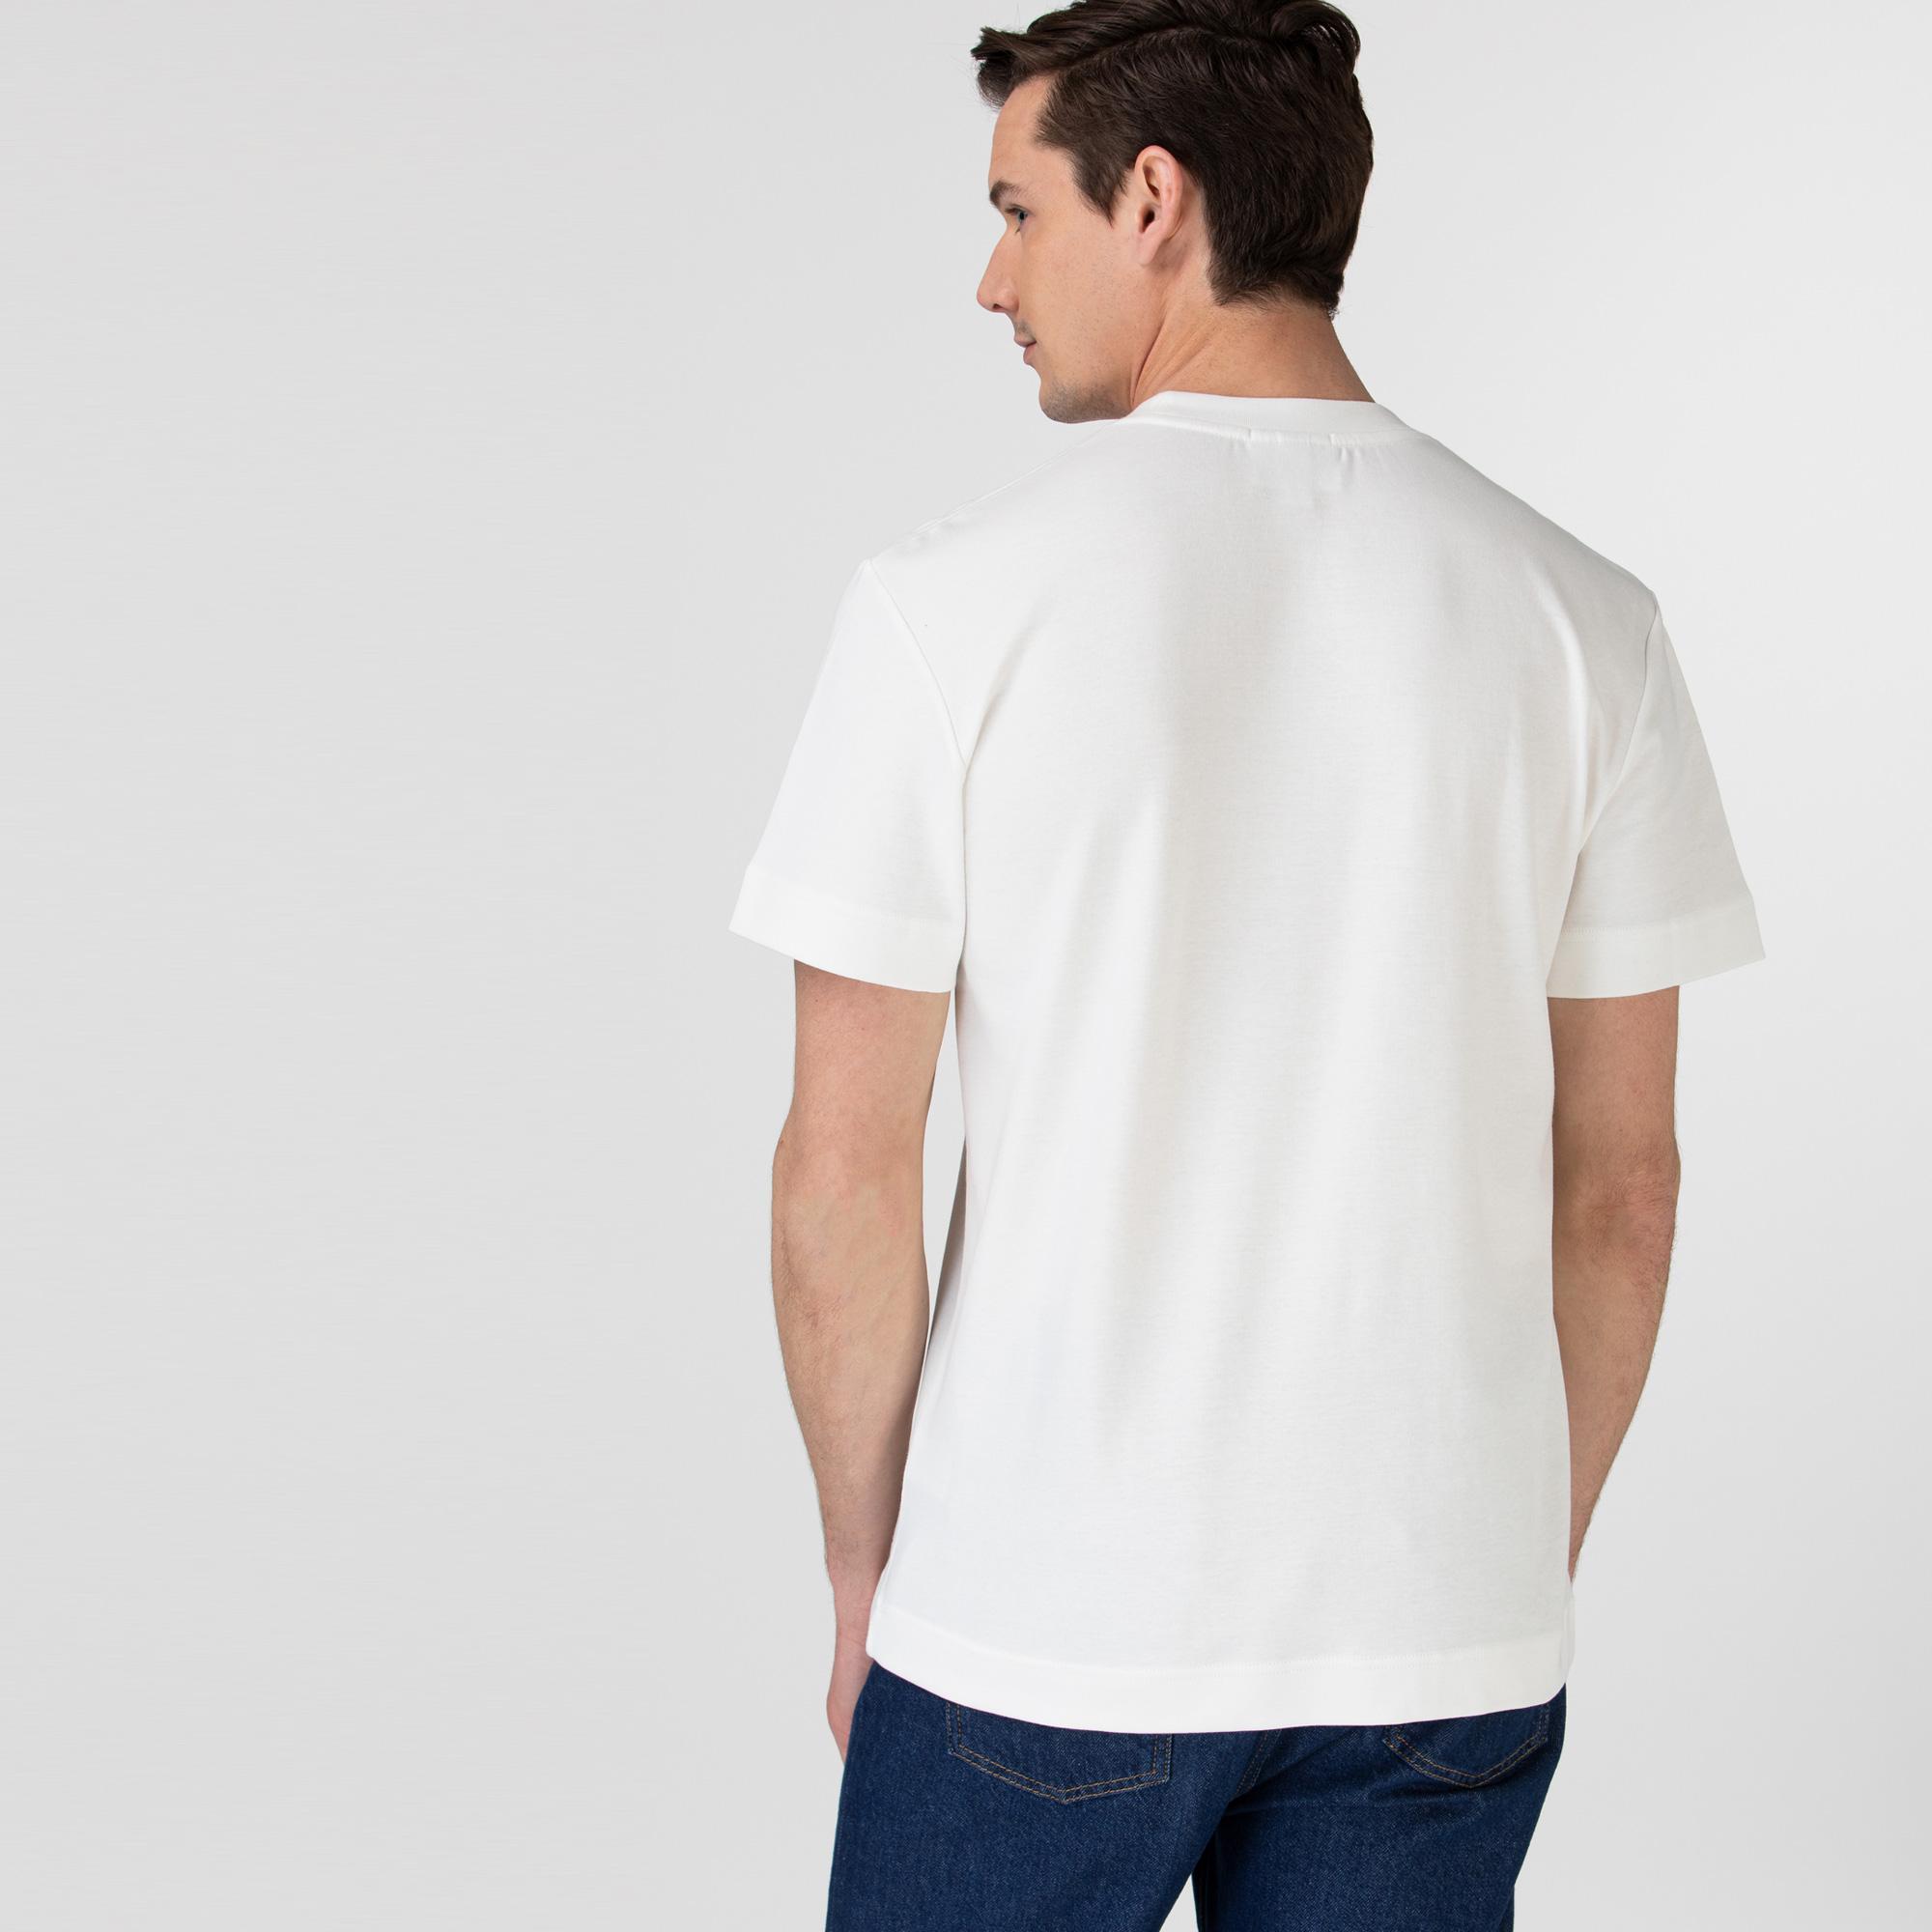 Lacoste Unisex Crew Neck Organic Cotton T-shirt